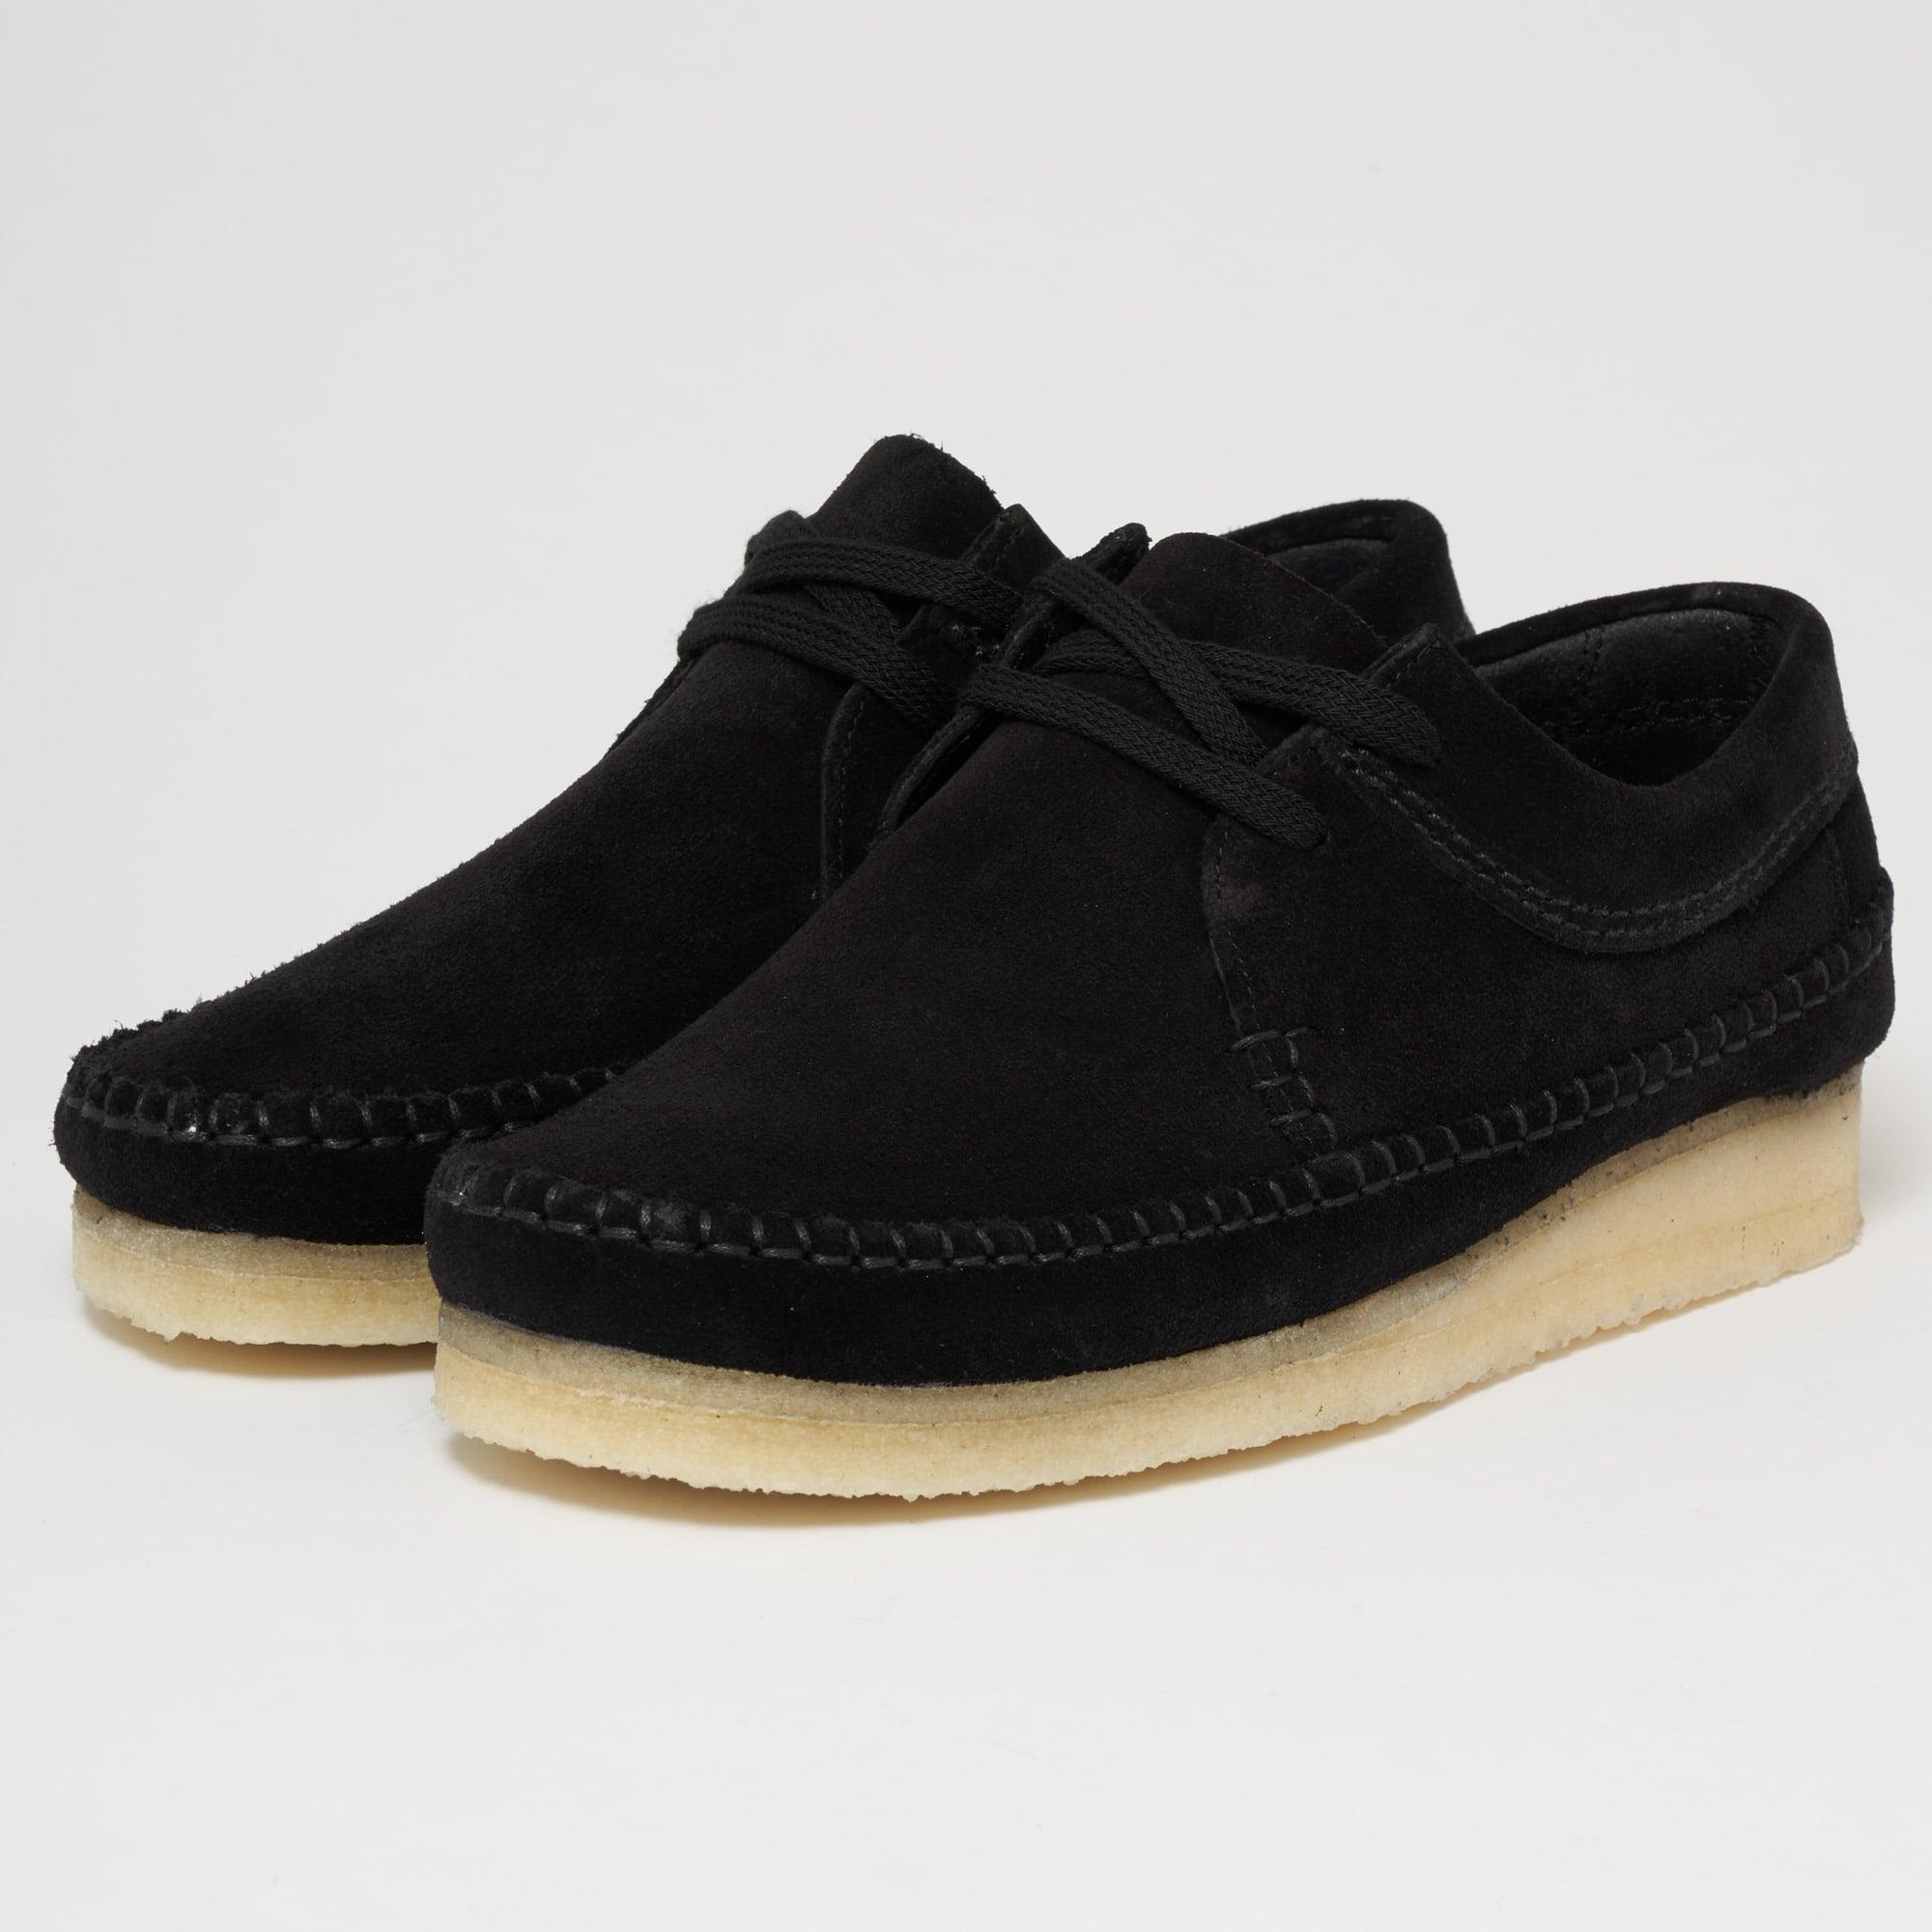 Weaver Black Suede Shoes